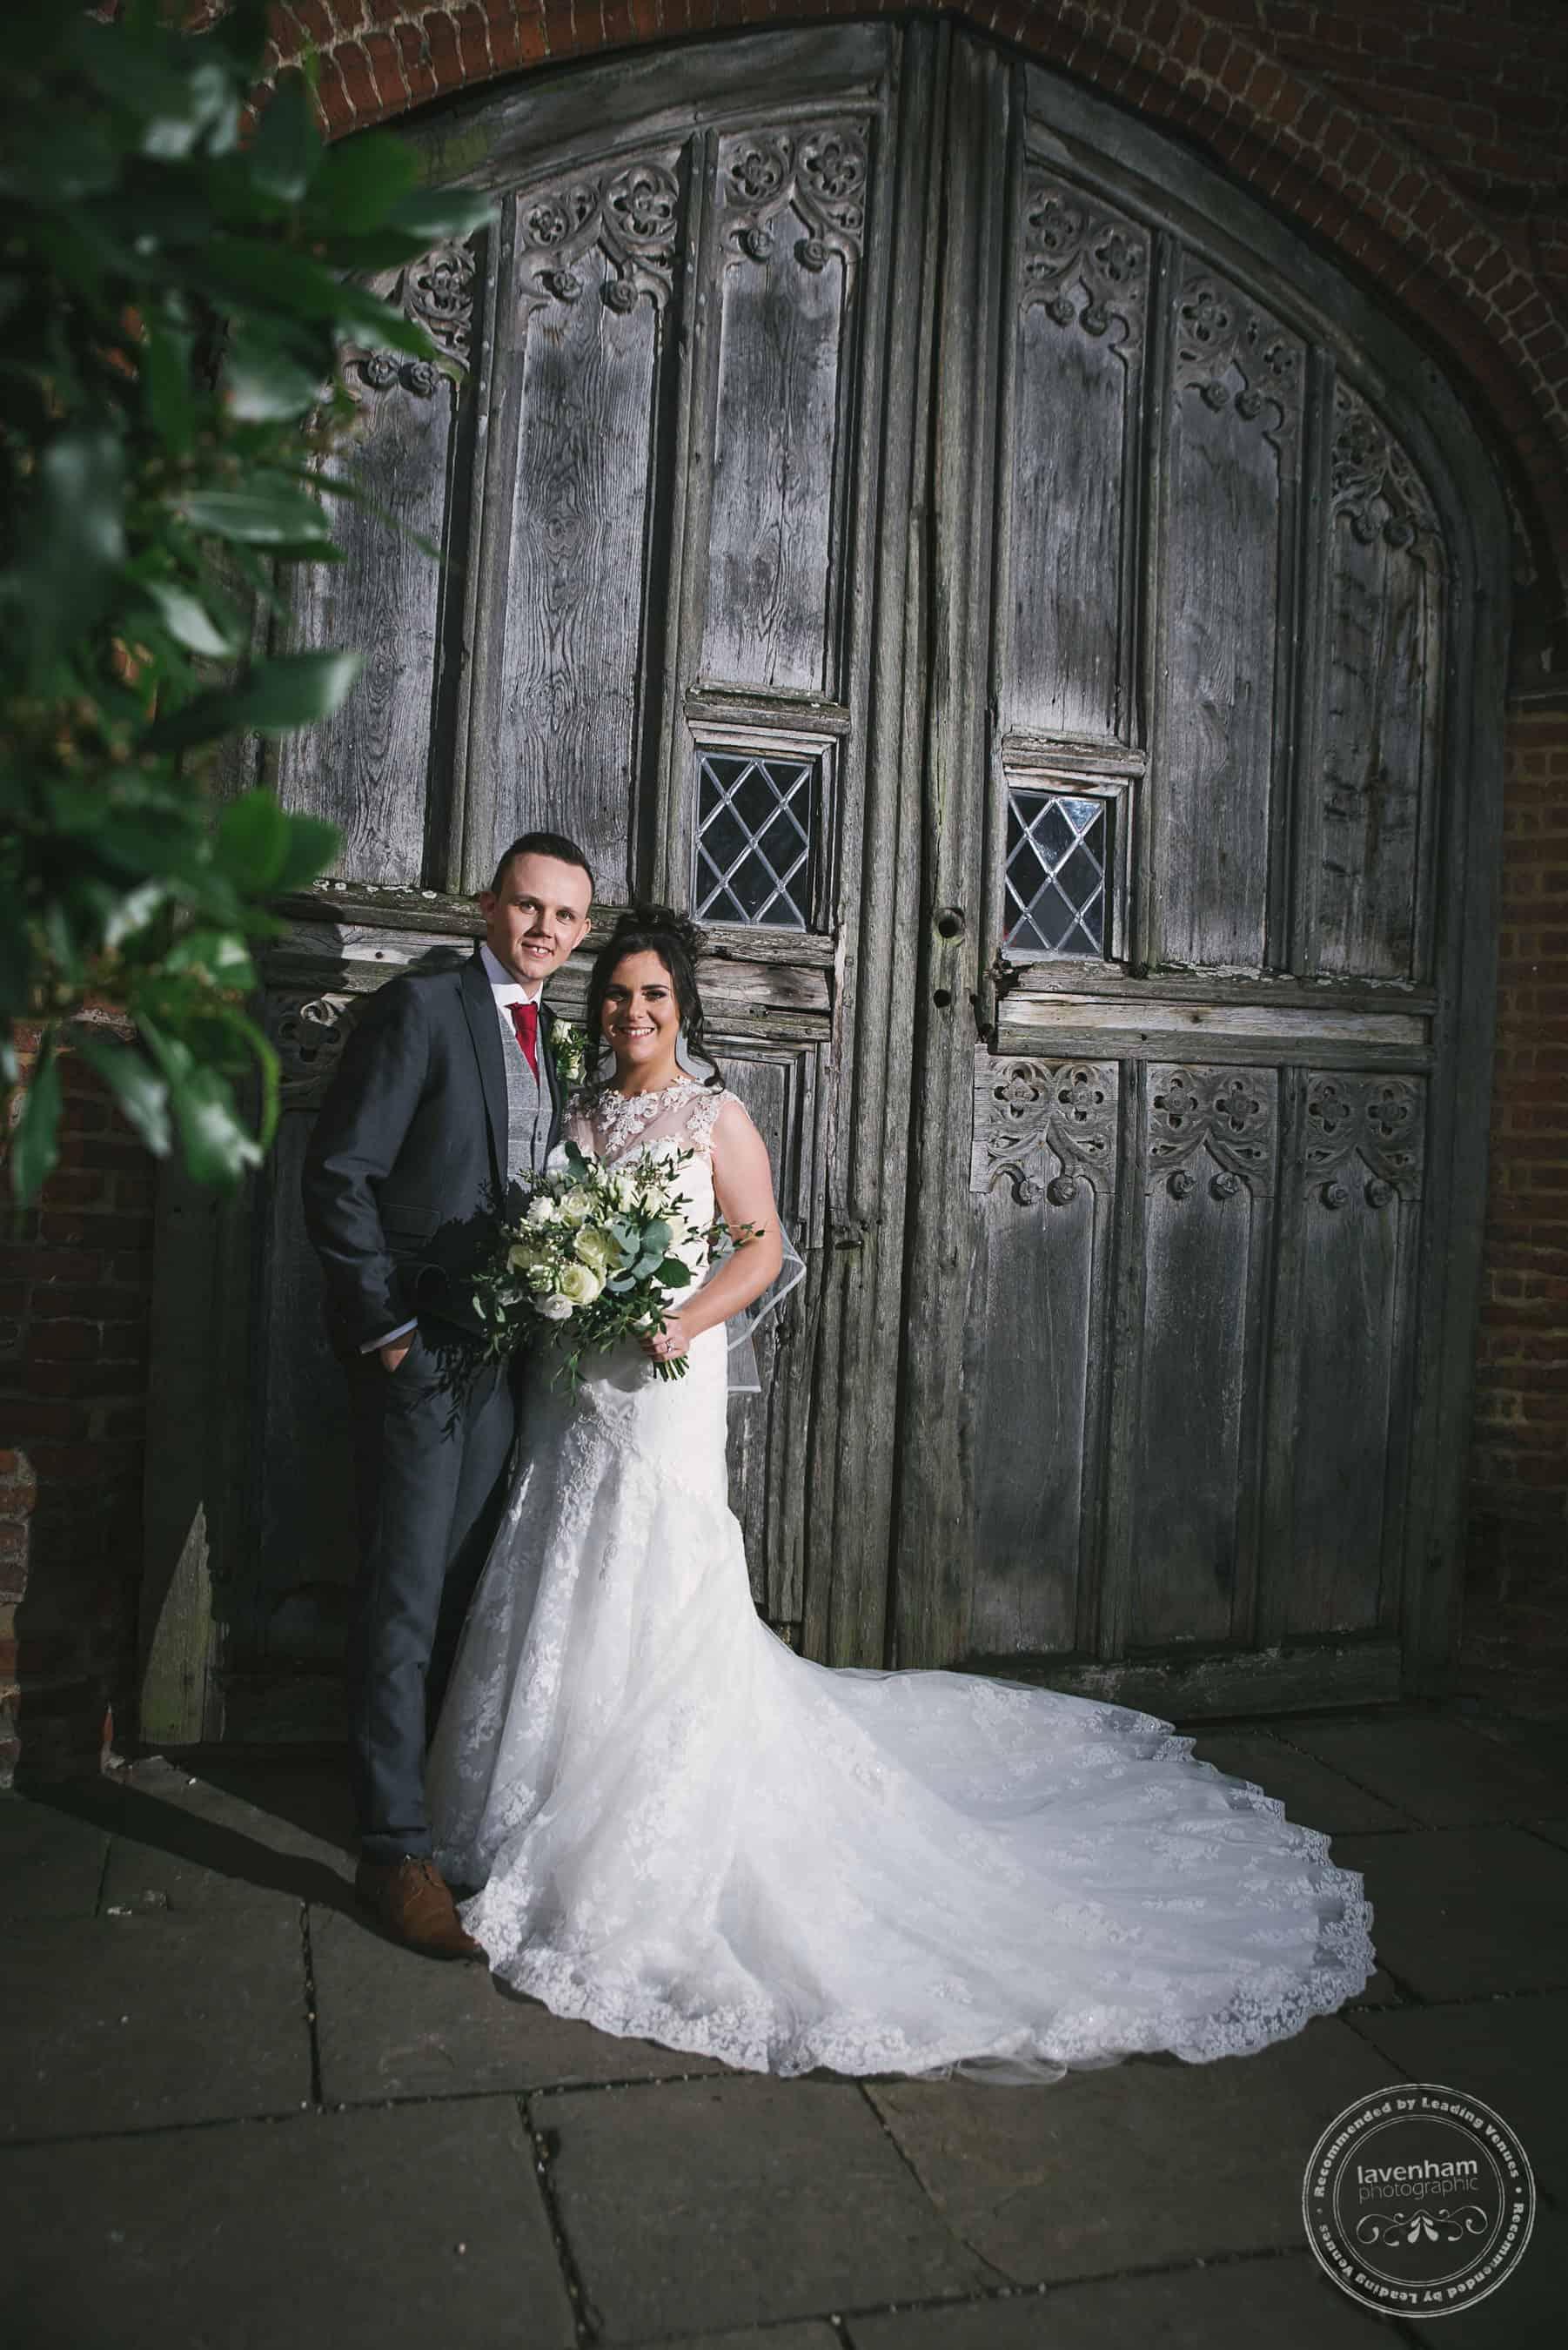 251118 Leez Priory Wedding Photography by Lavenham Photographic 073